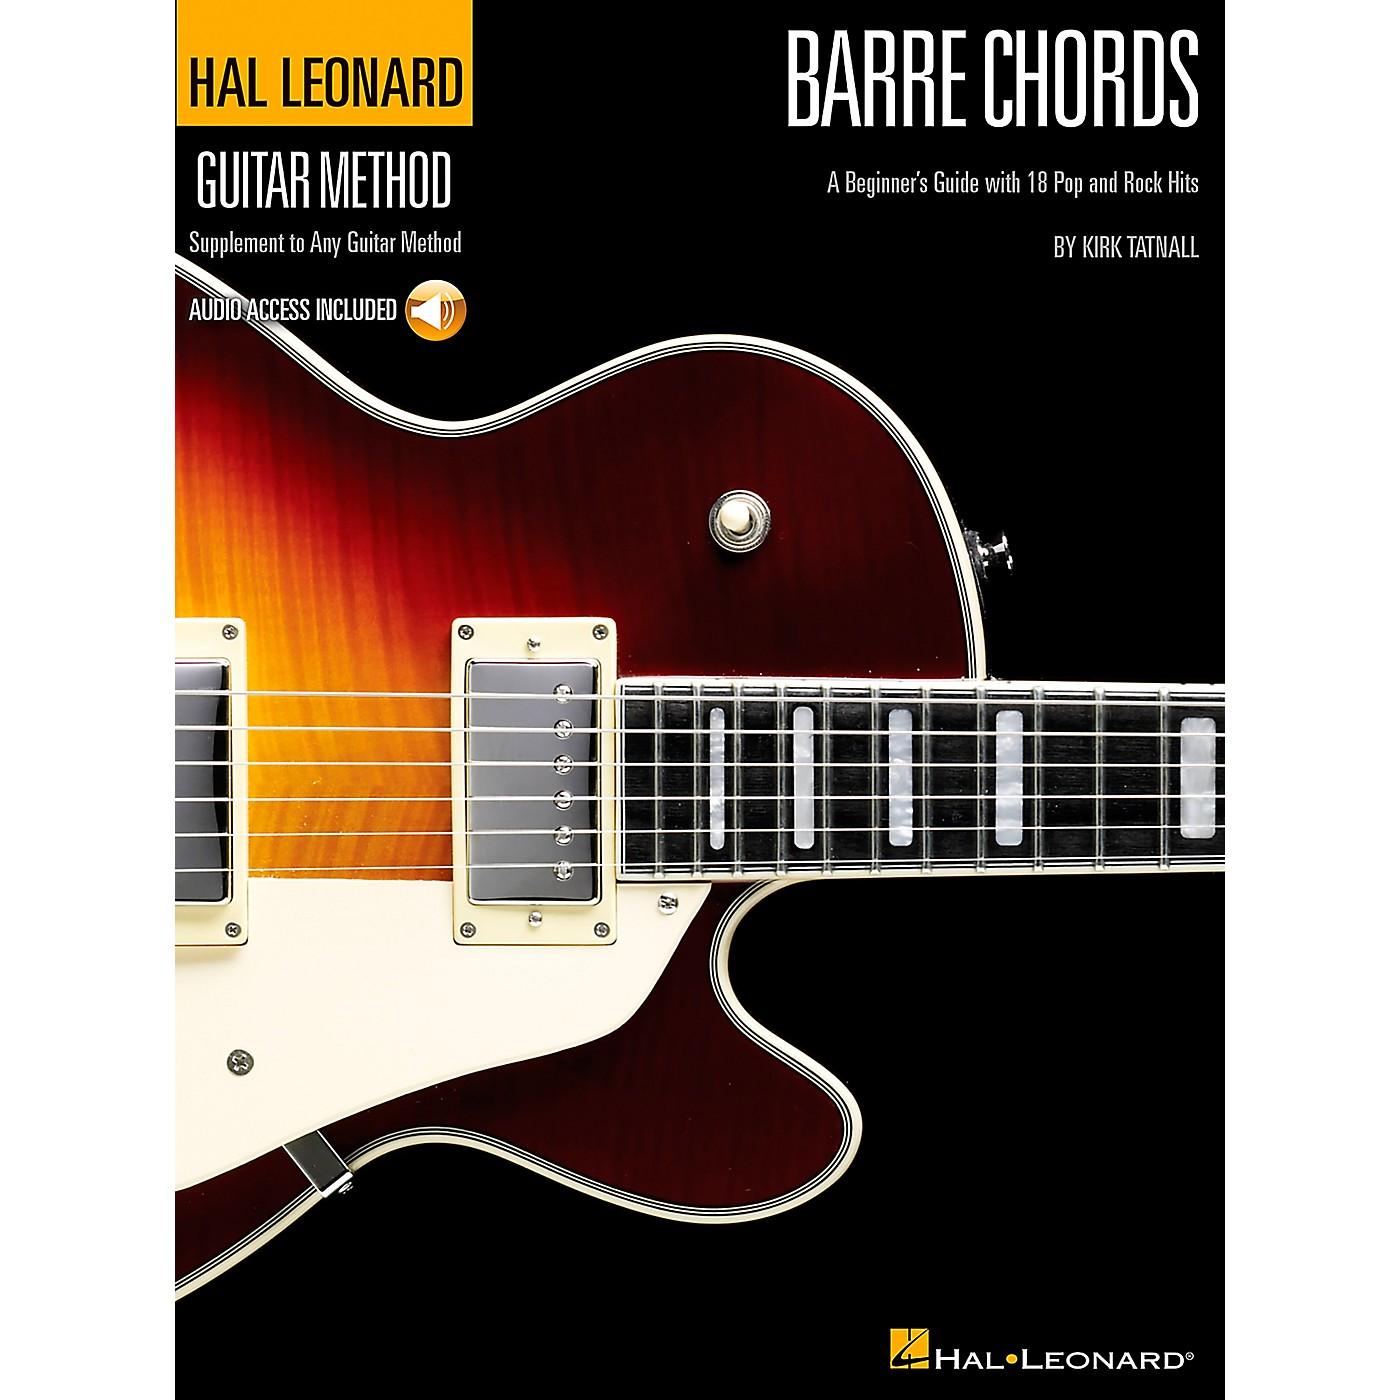 Hal Leonard Barre Chords - Guitar Method Supplement (Book/CD) thumbnail